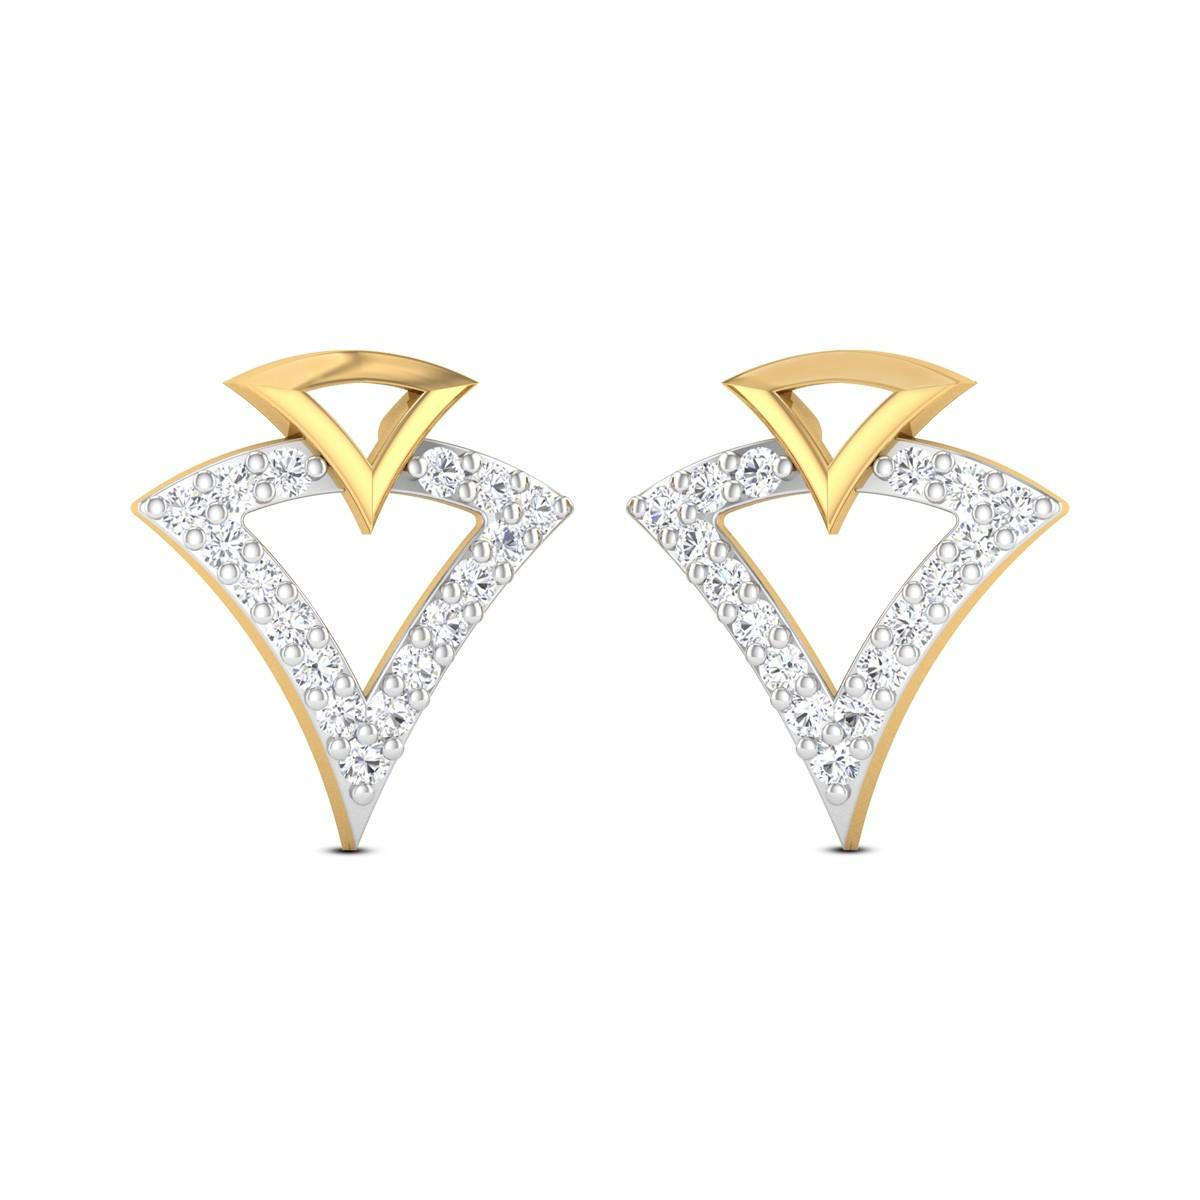 Laentina Diamond Earrings